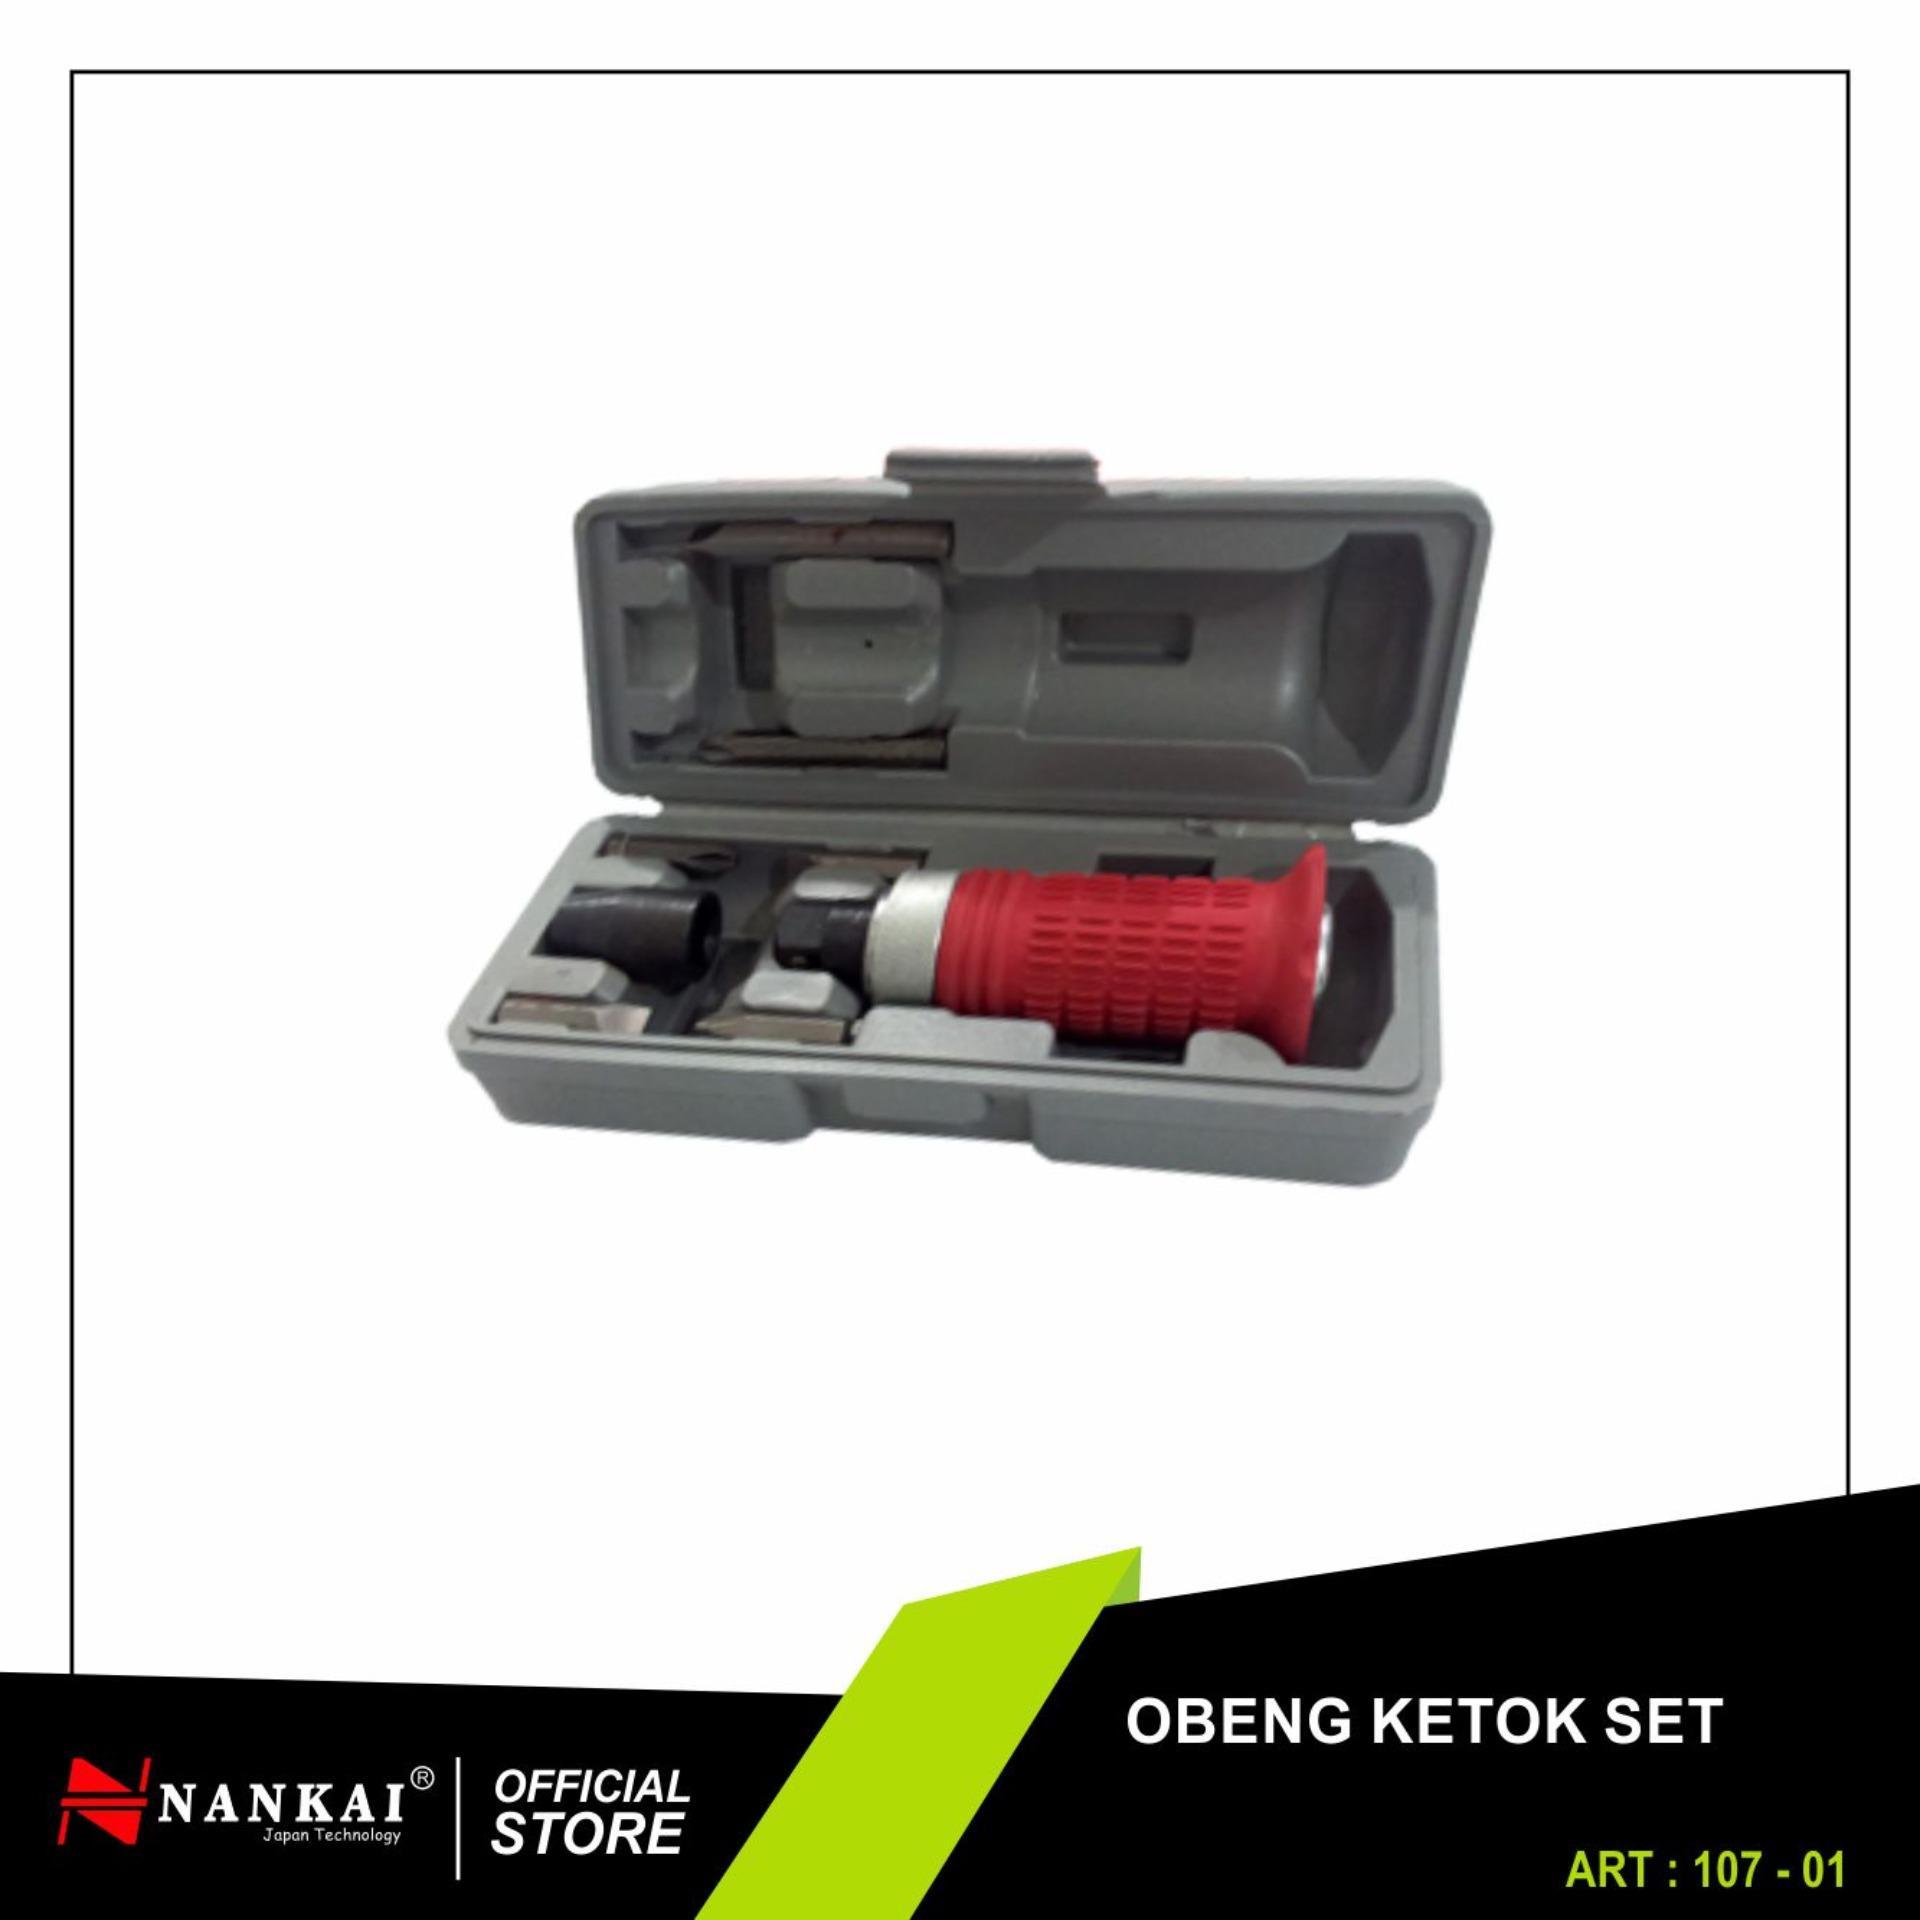 Nankai Obeng Ketok Getok Handle Karet Set - Impact Driver Perkakas Tool